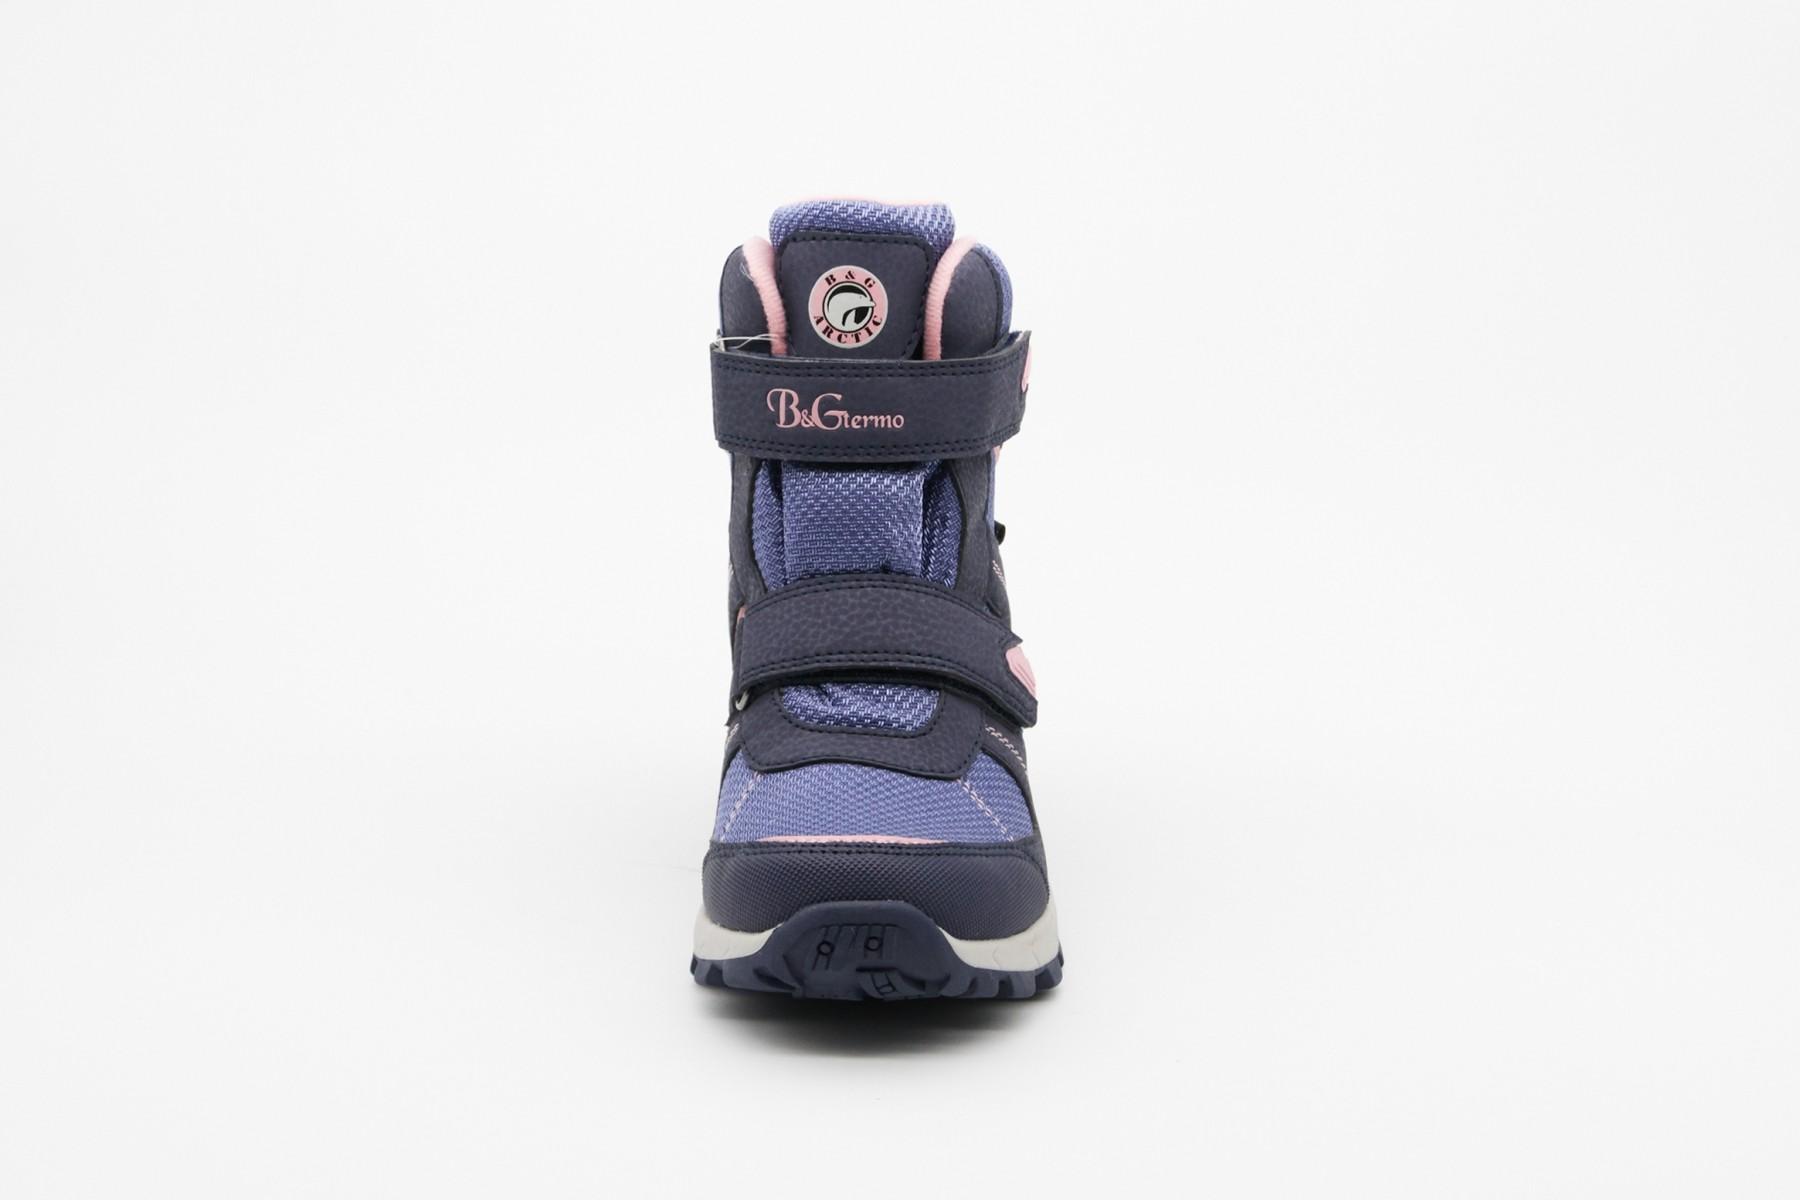 ТЕРМО-обувь EVS21-12/0312 850грн фото